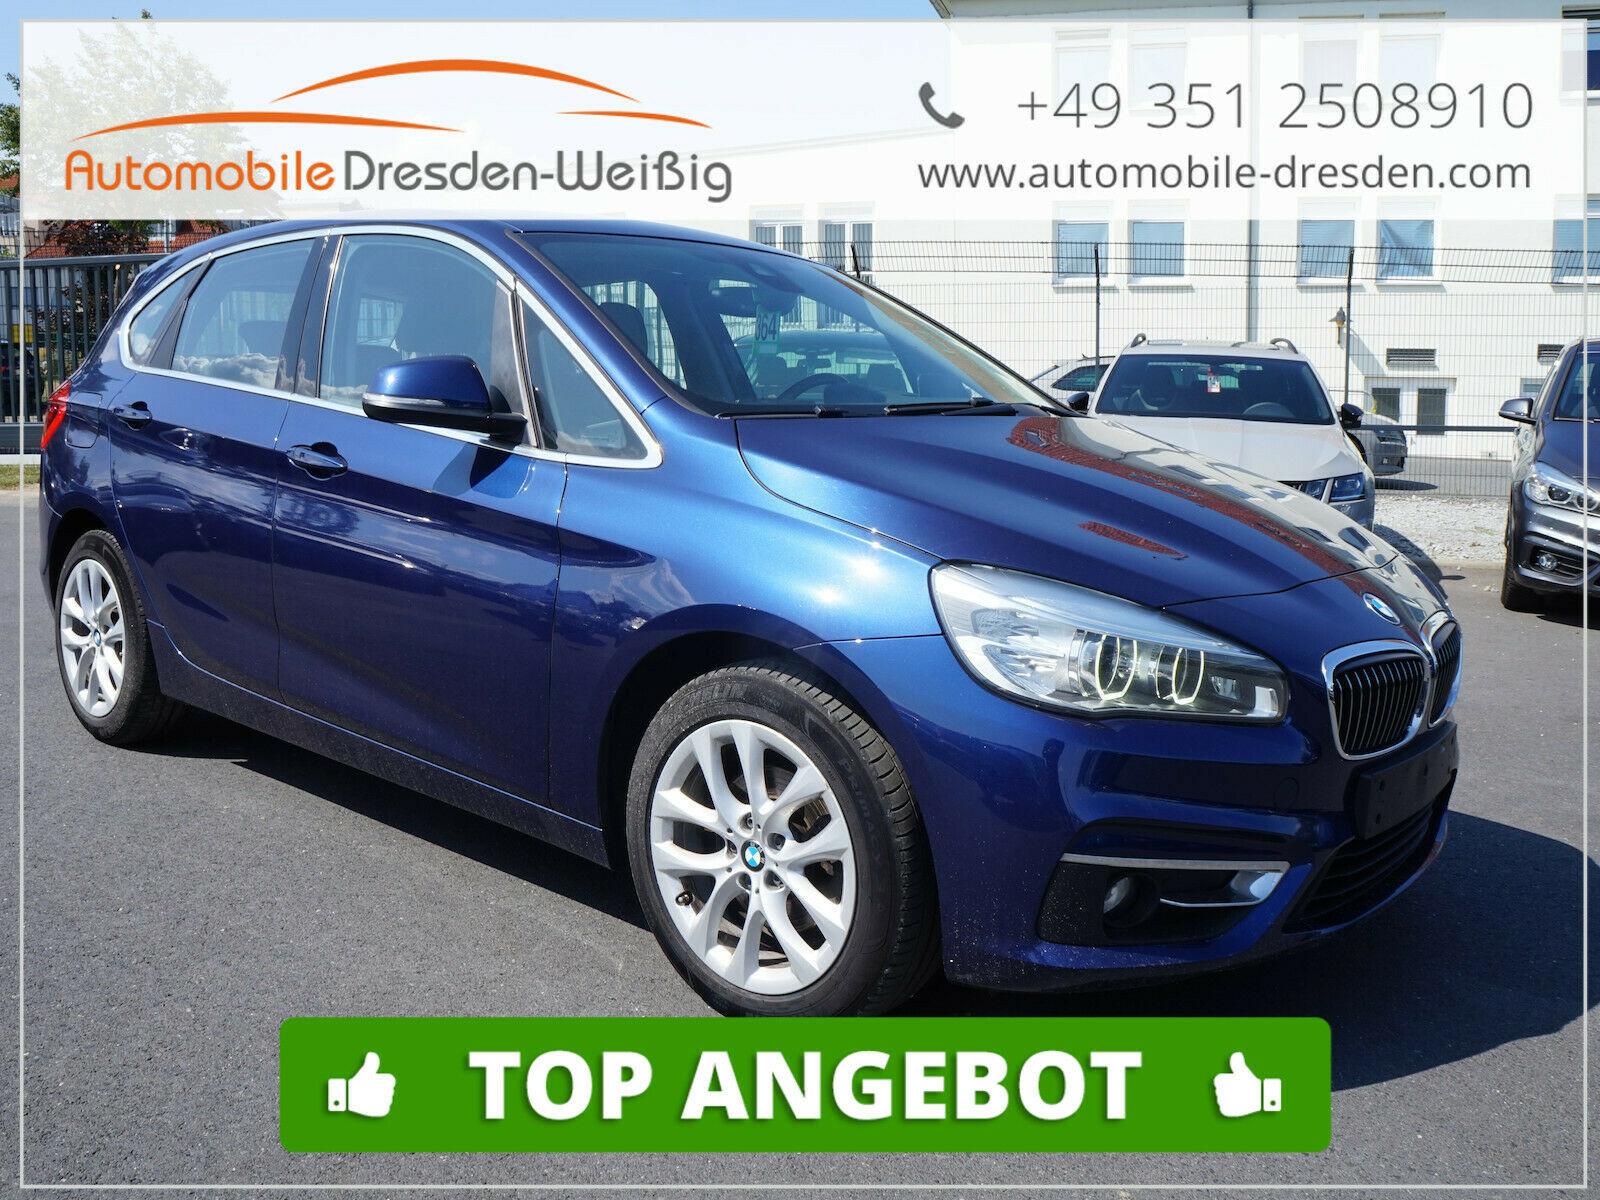 BMW 218 Active Tourer LuxuryLine*Leder*Navi+*LED, Jahr 2015, Diesel